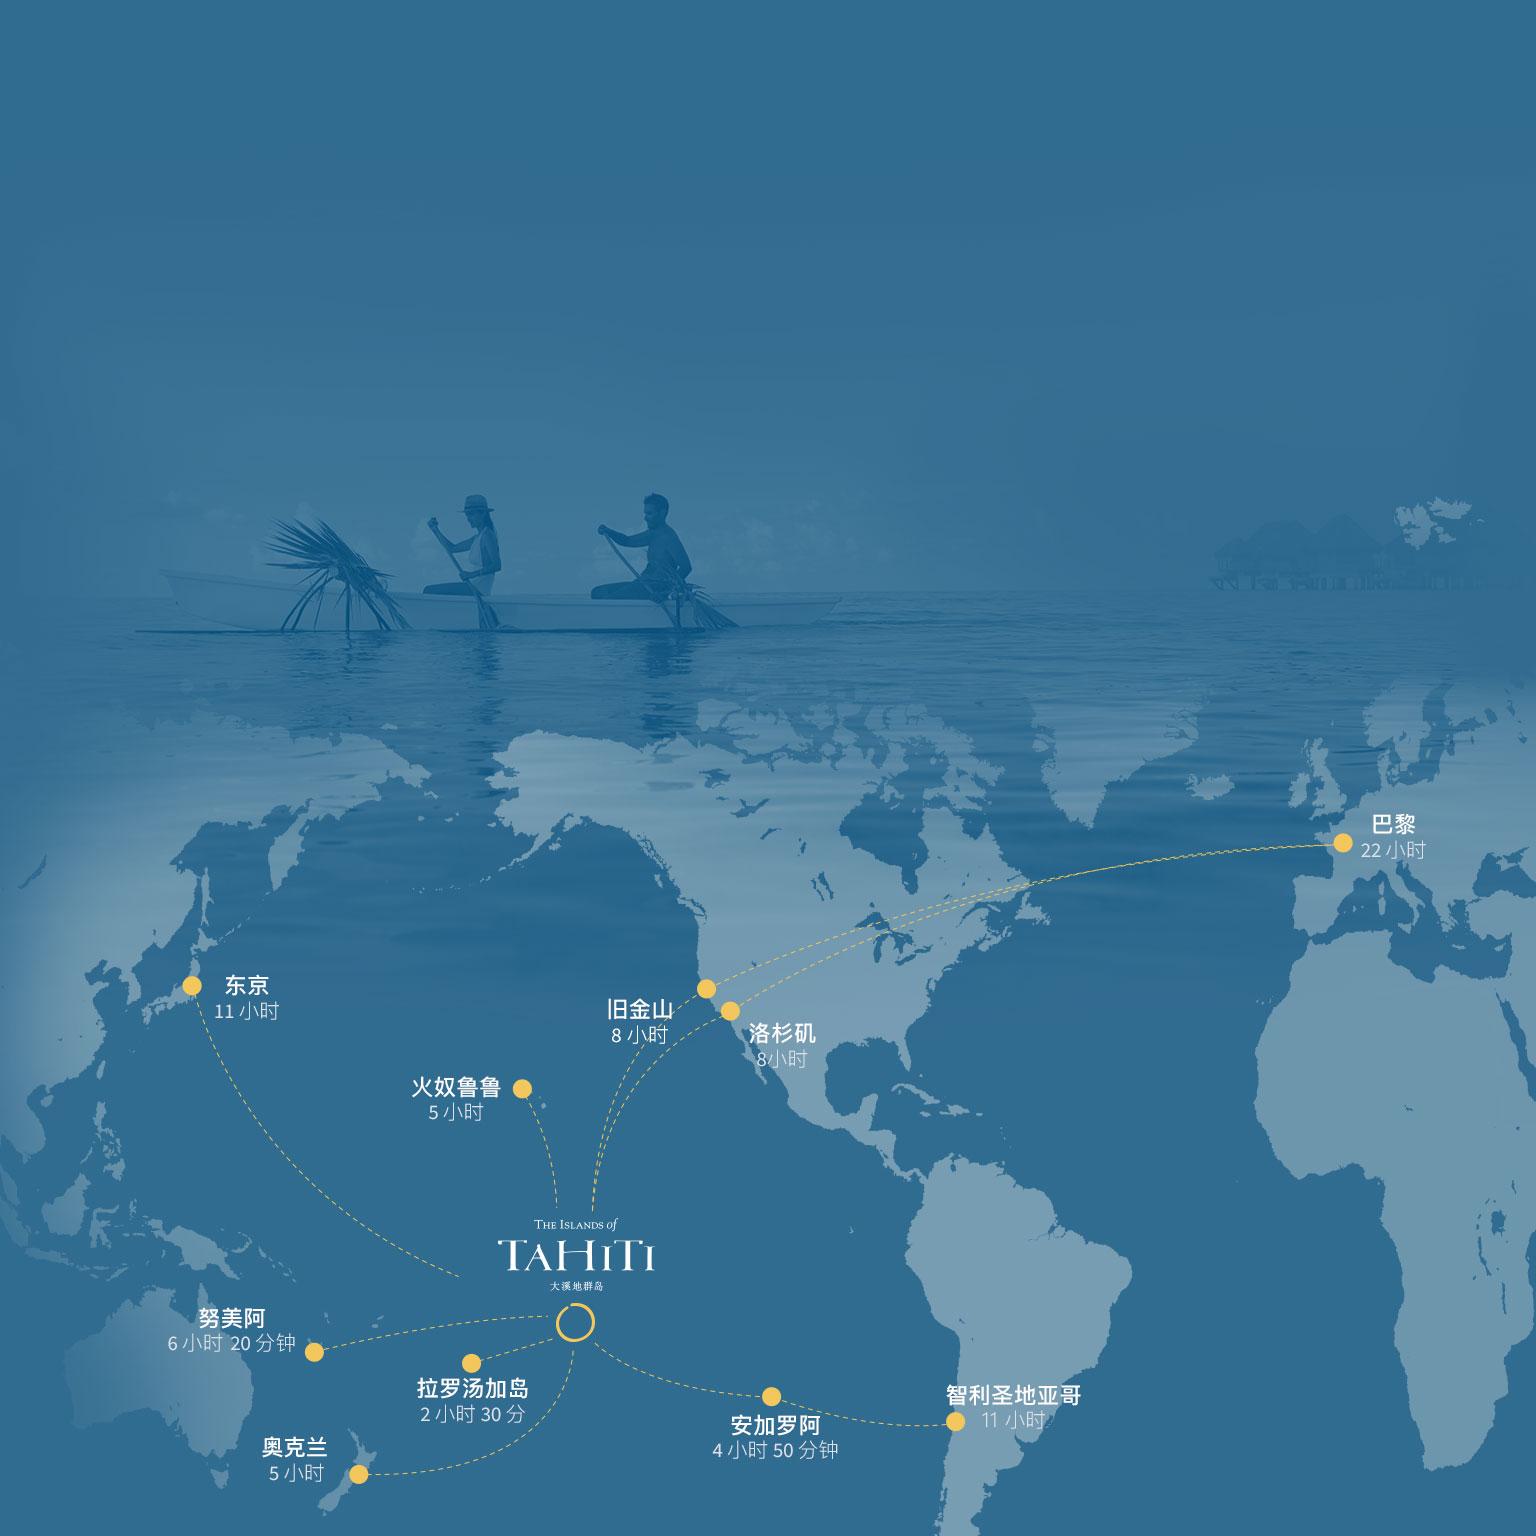 tahiti-homepage-map-t_chinese | Tahiti Tourisme